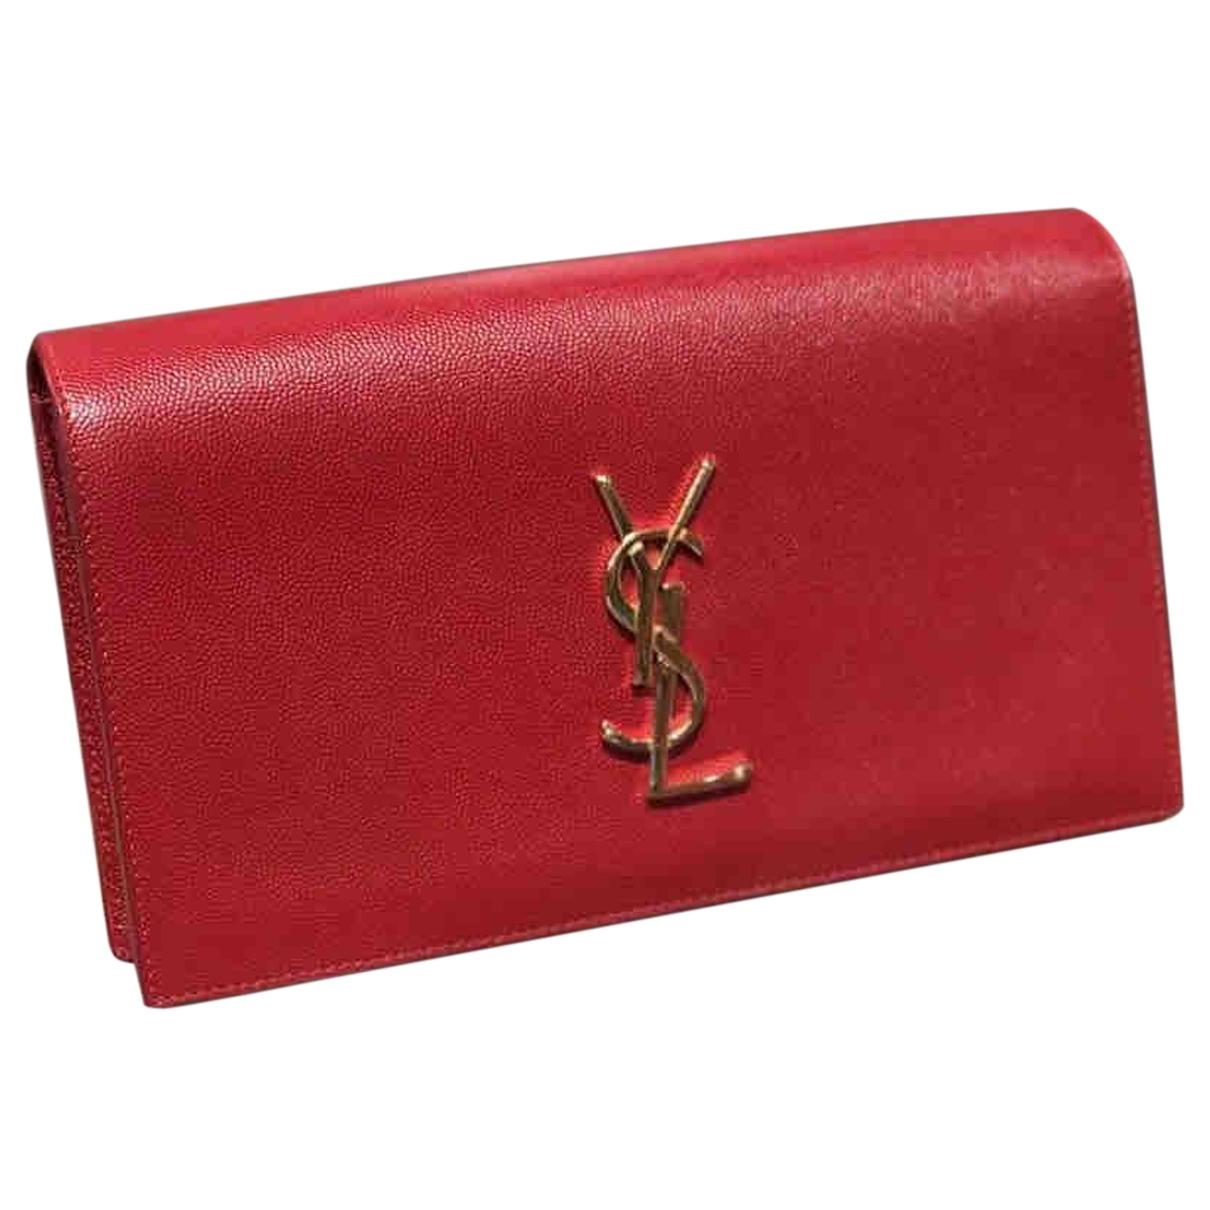 Saint Laurent Kate monogramme Handtasche in  Rot Leder